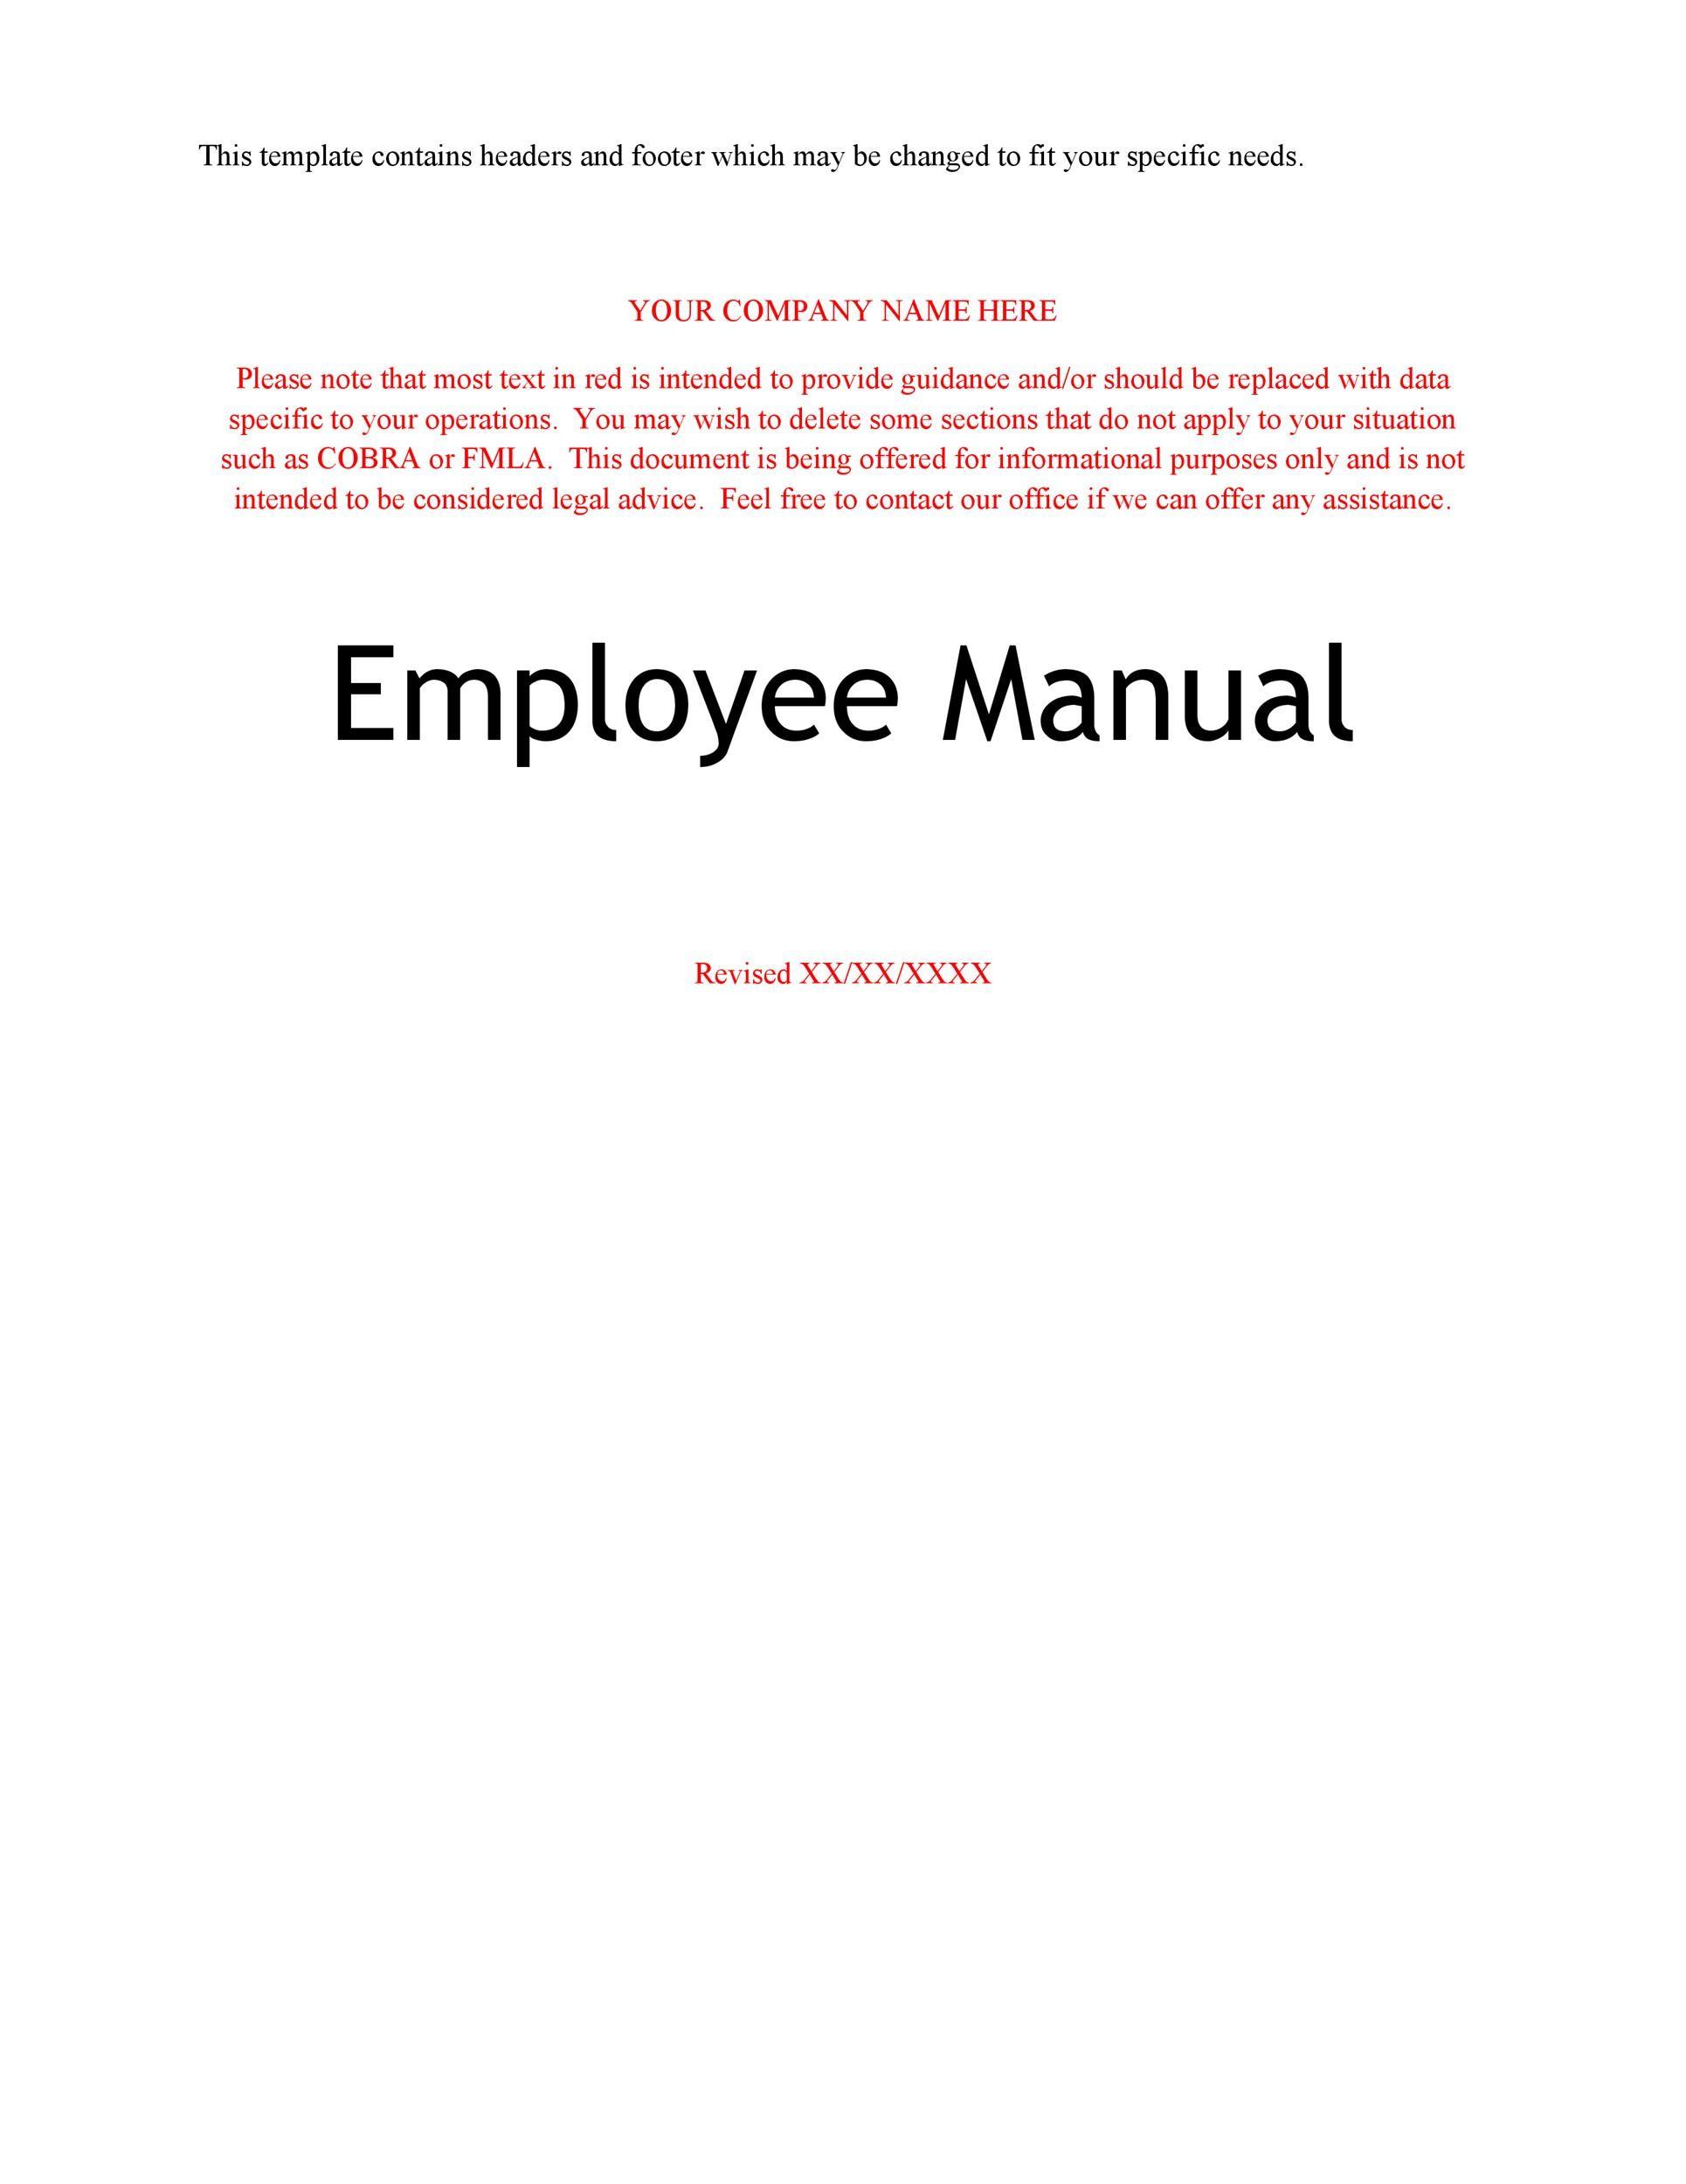 Free employee handbook template 22